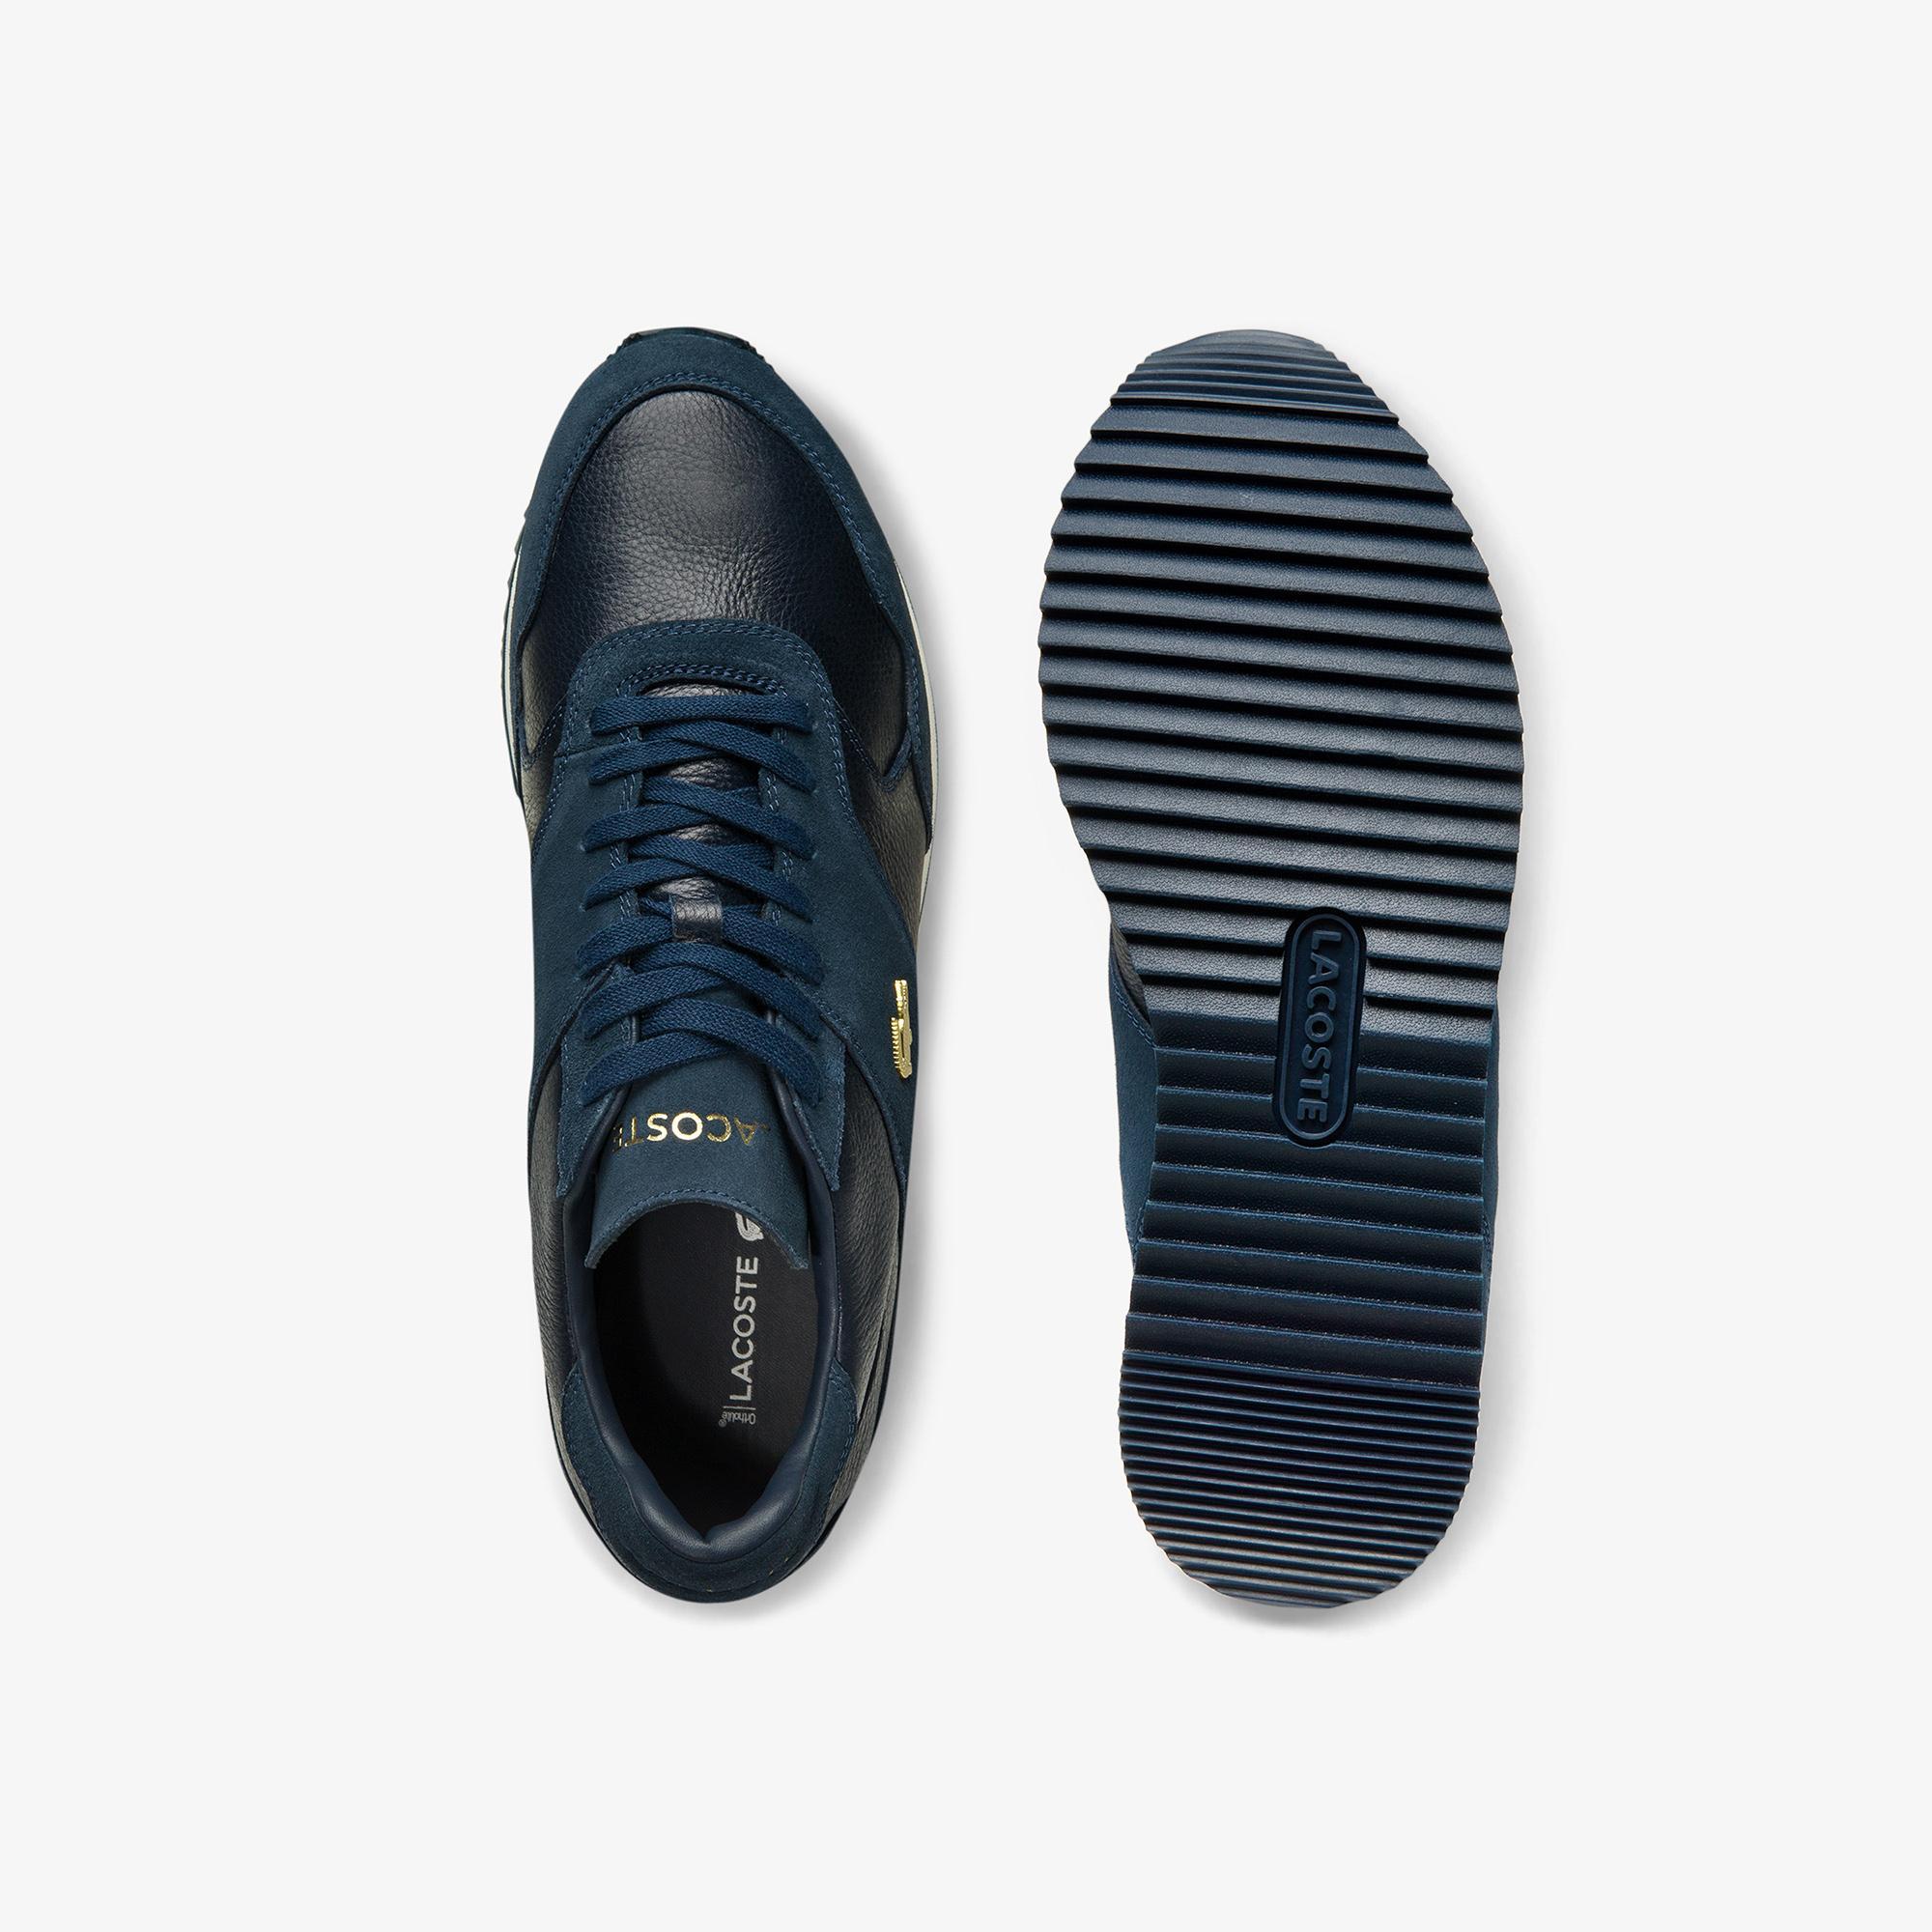 Lacoste Men's Aesthet Luxe Leather Sneakers